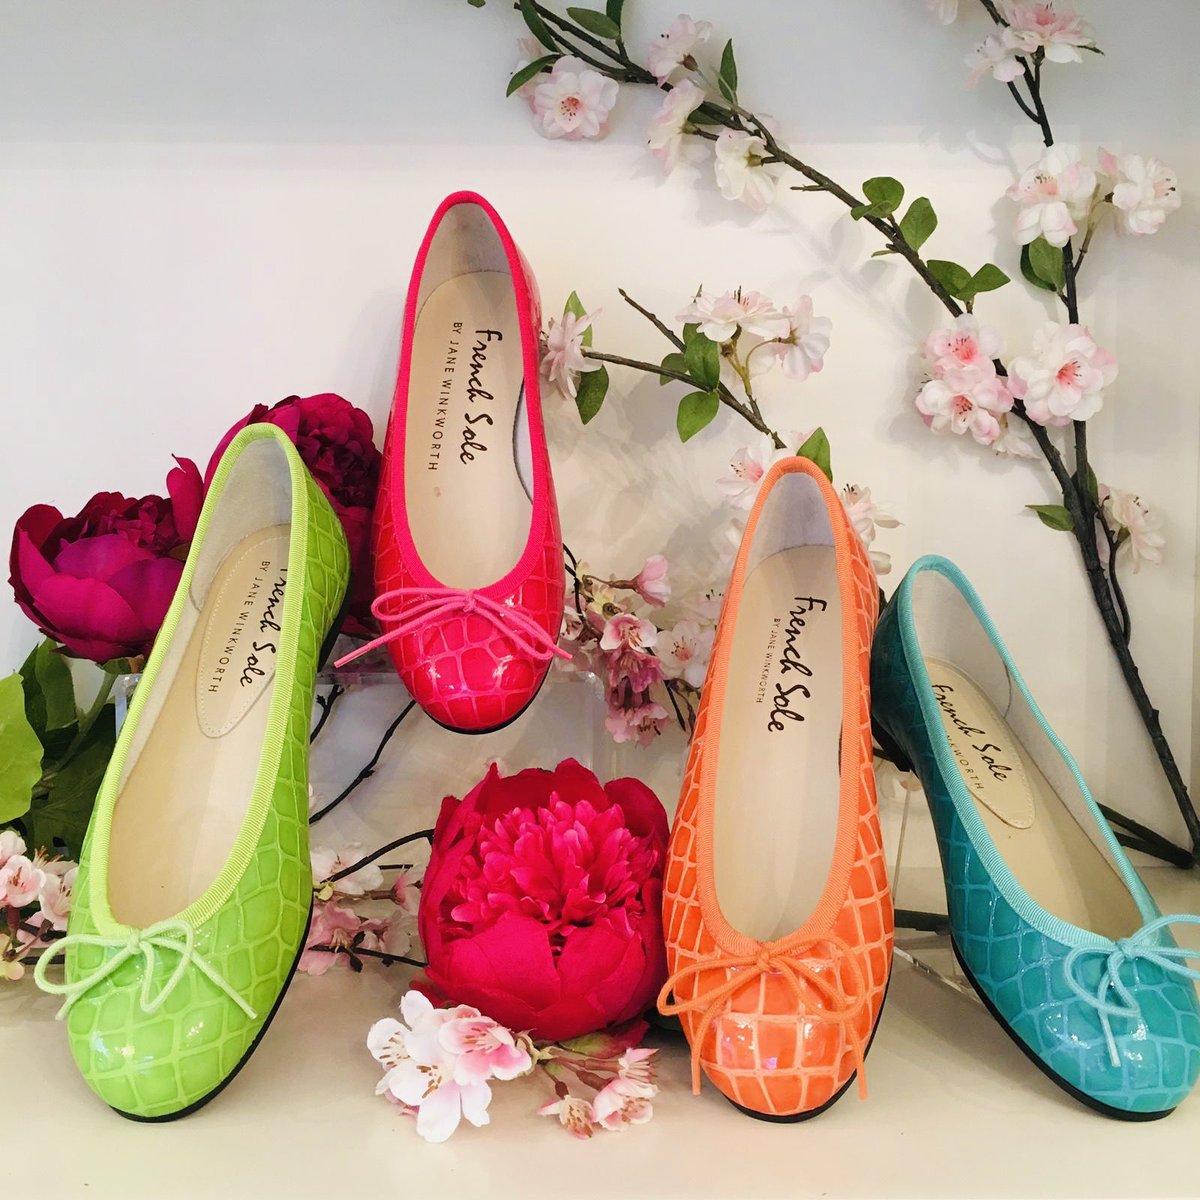 fa604c47e410  brightshoes hashtag on Twitter